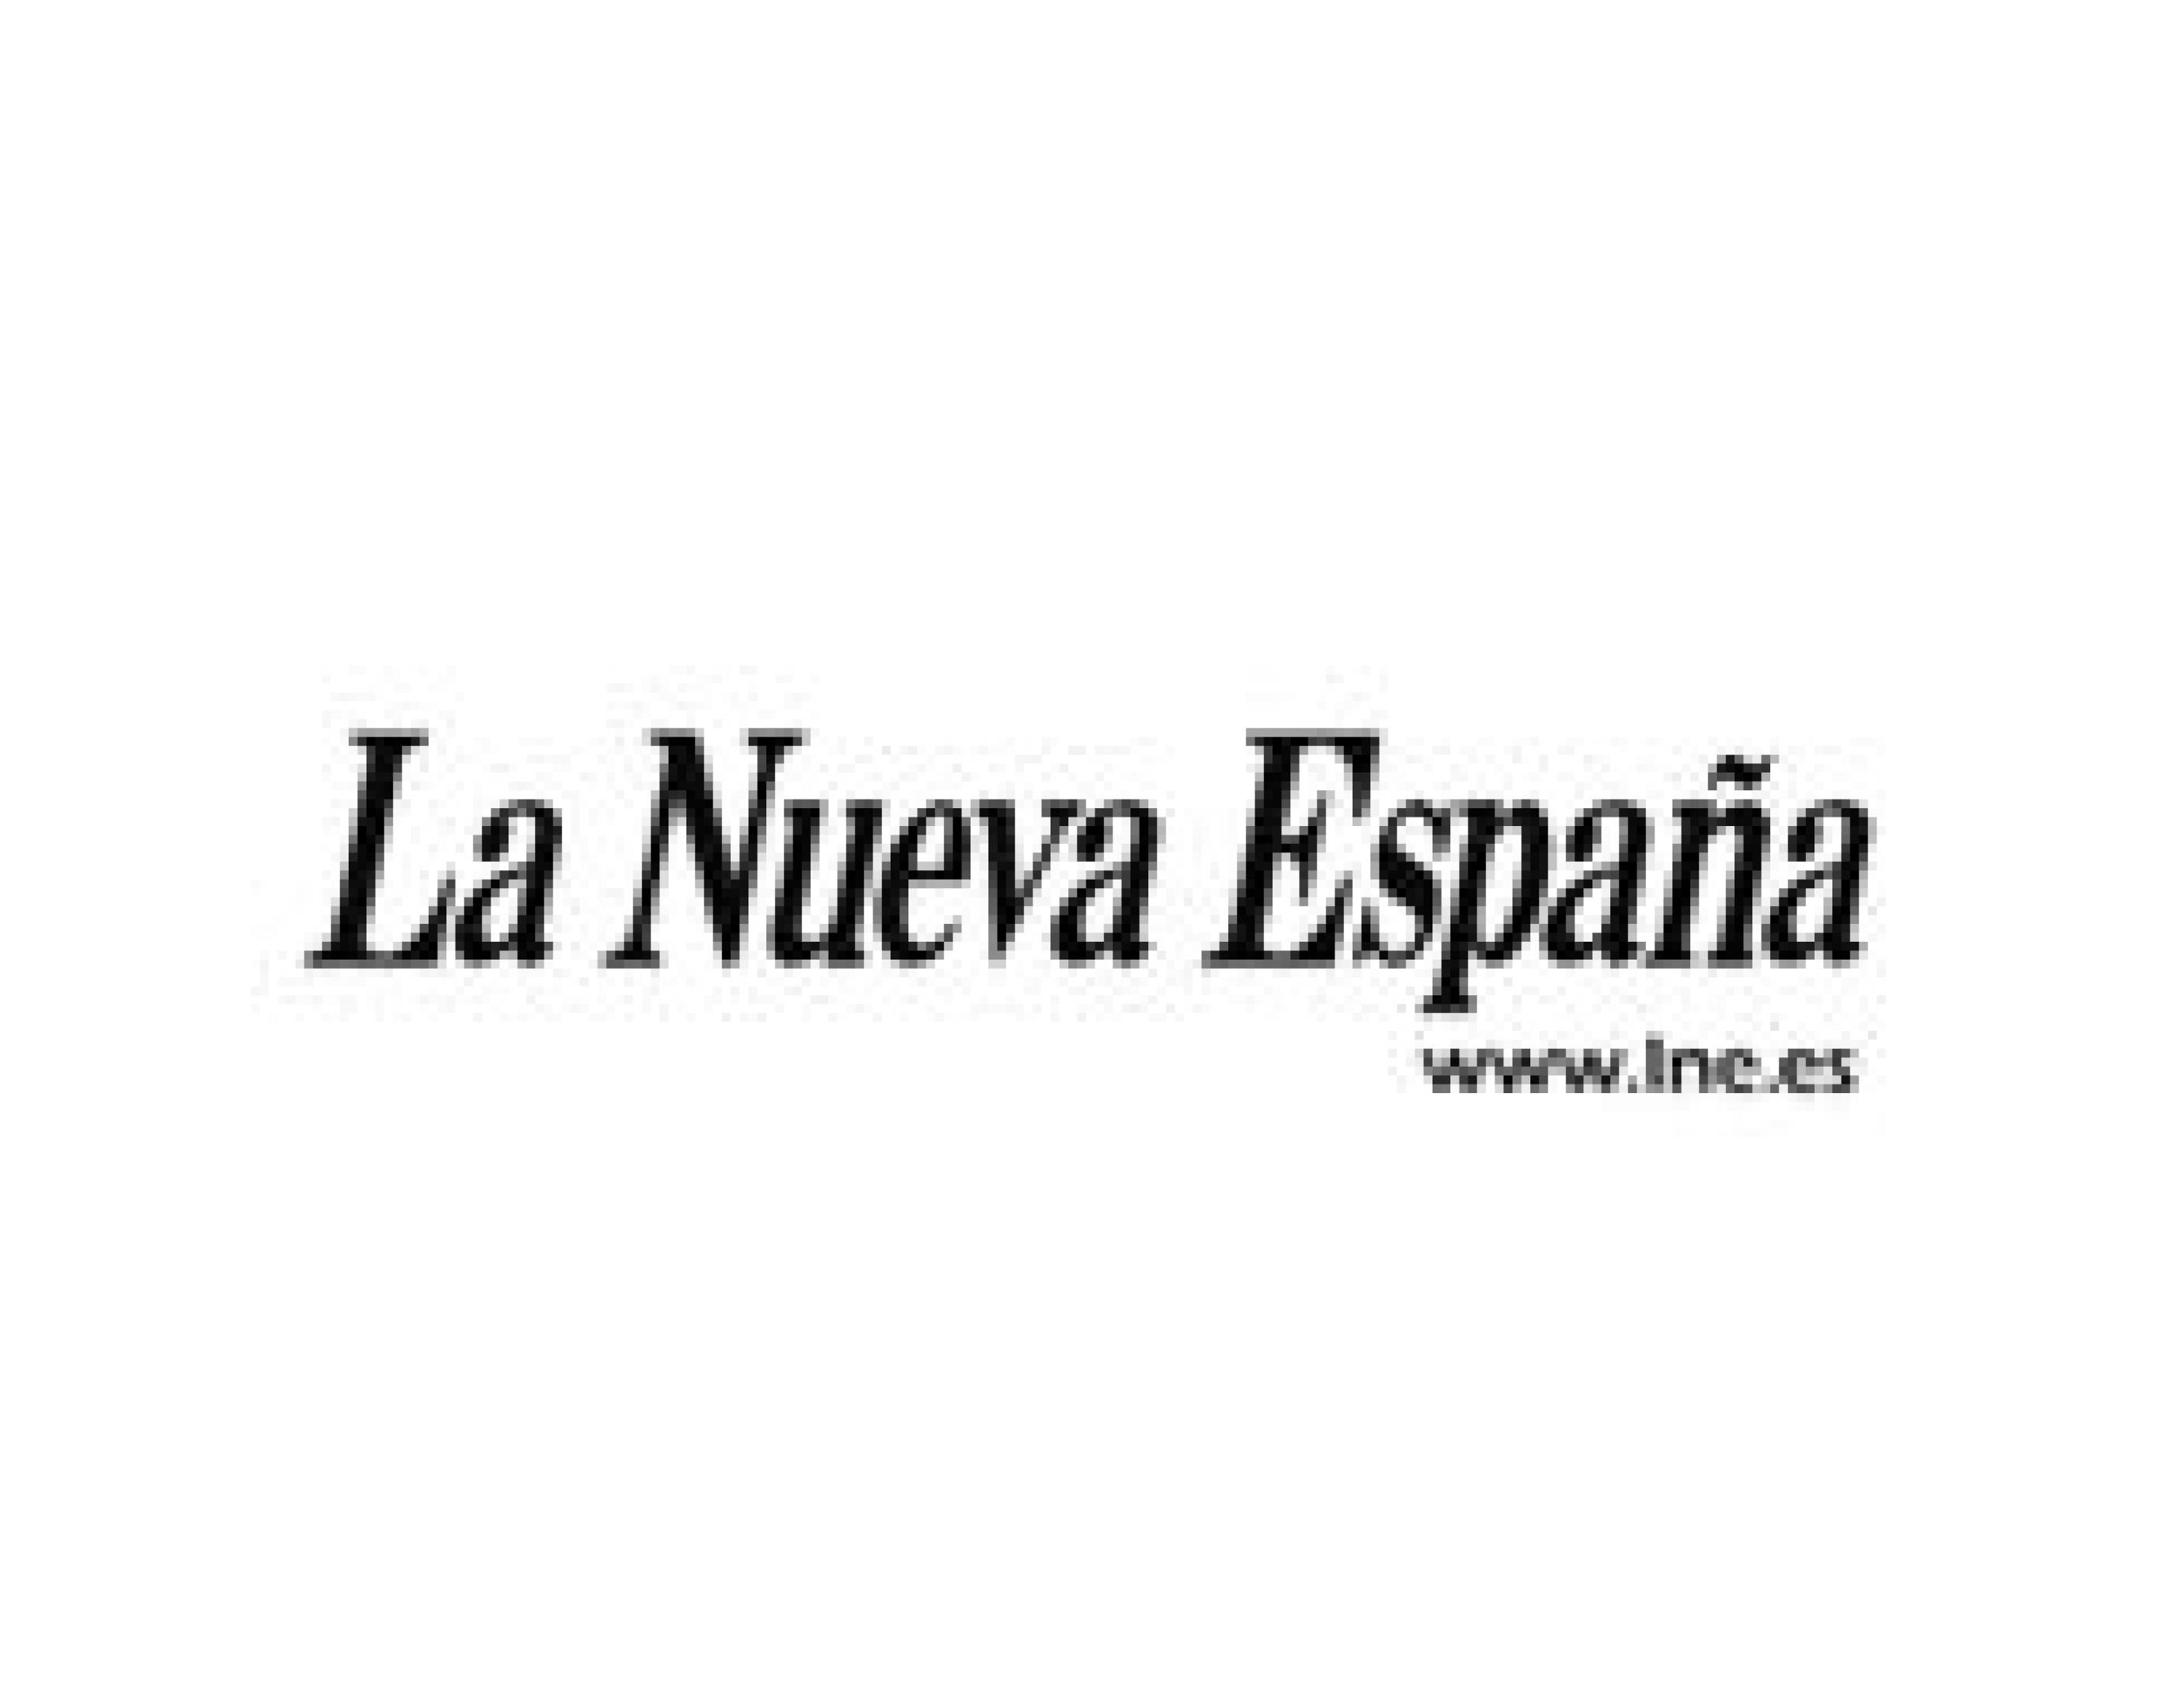 Logo LNE